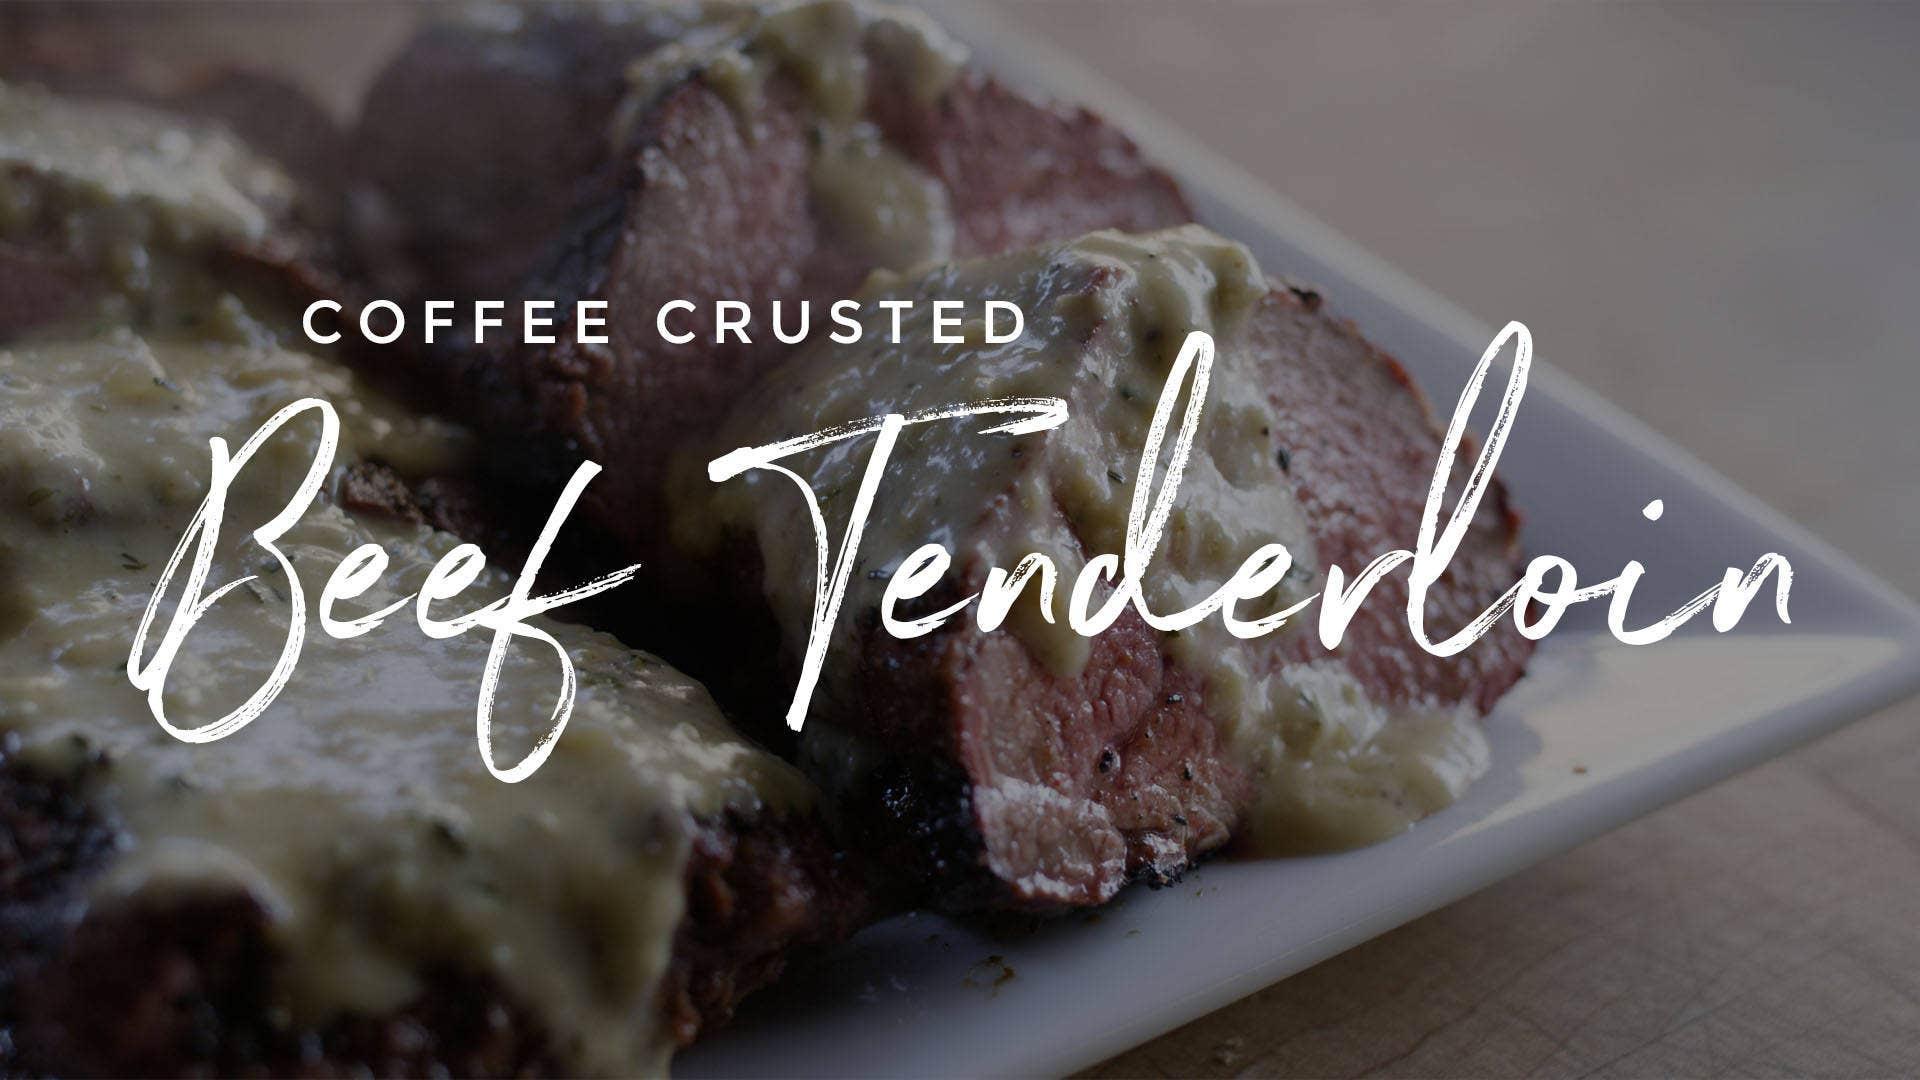 Coffee Crusted Beef Tenderloin Recipe